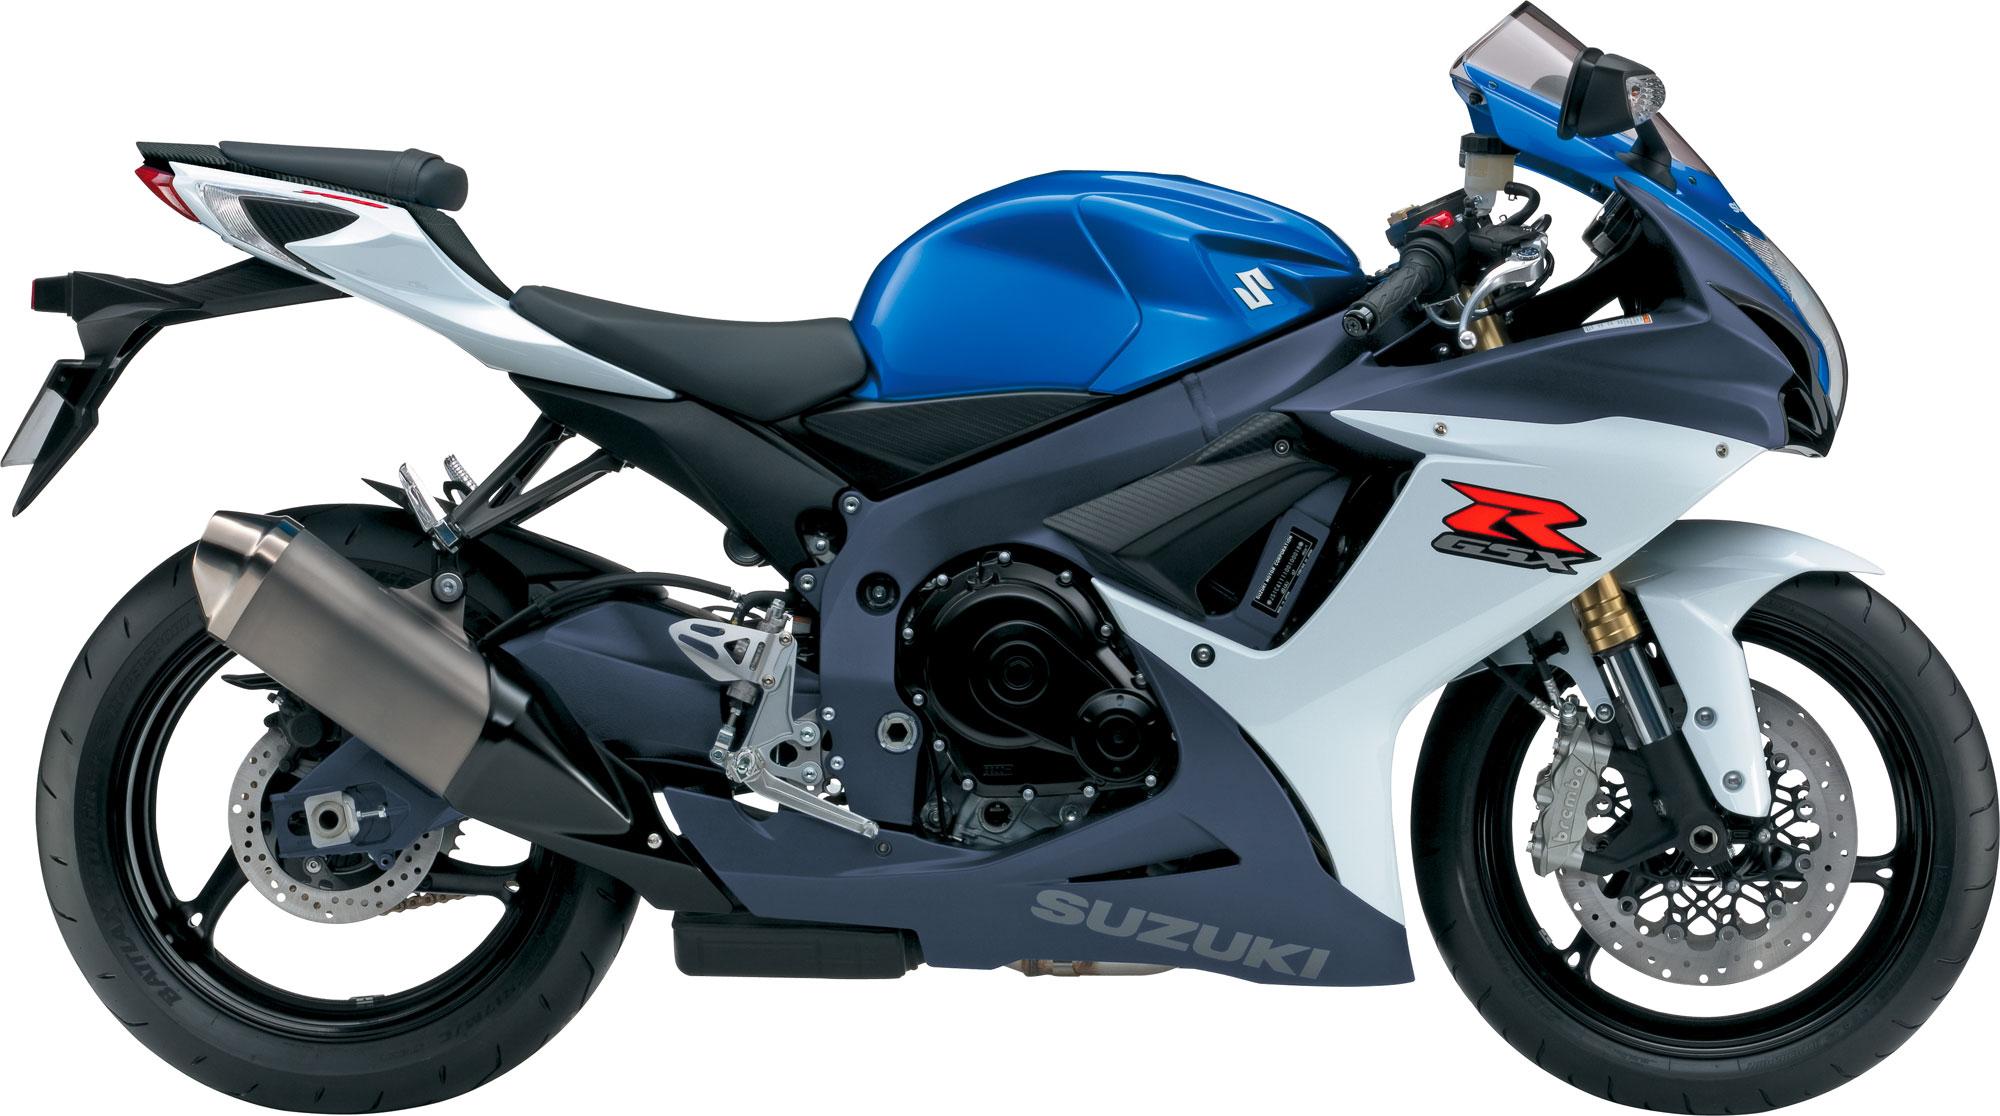 Suzuki Gsx R 750 Mod 2012 Objectif Moto